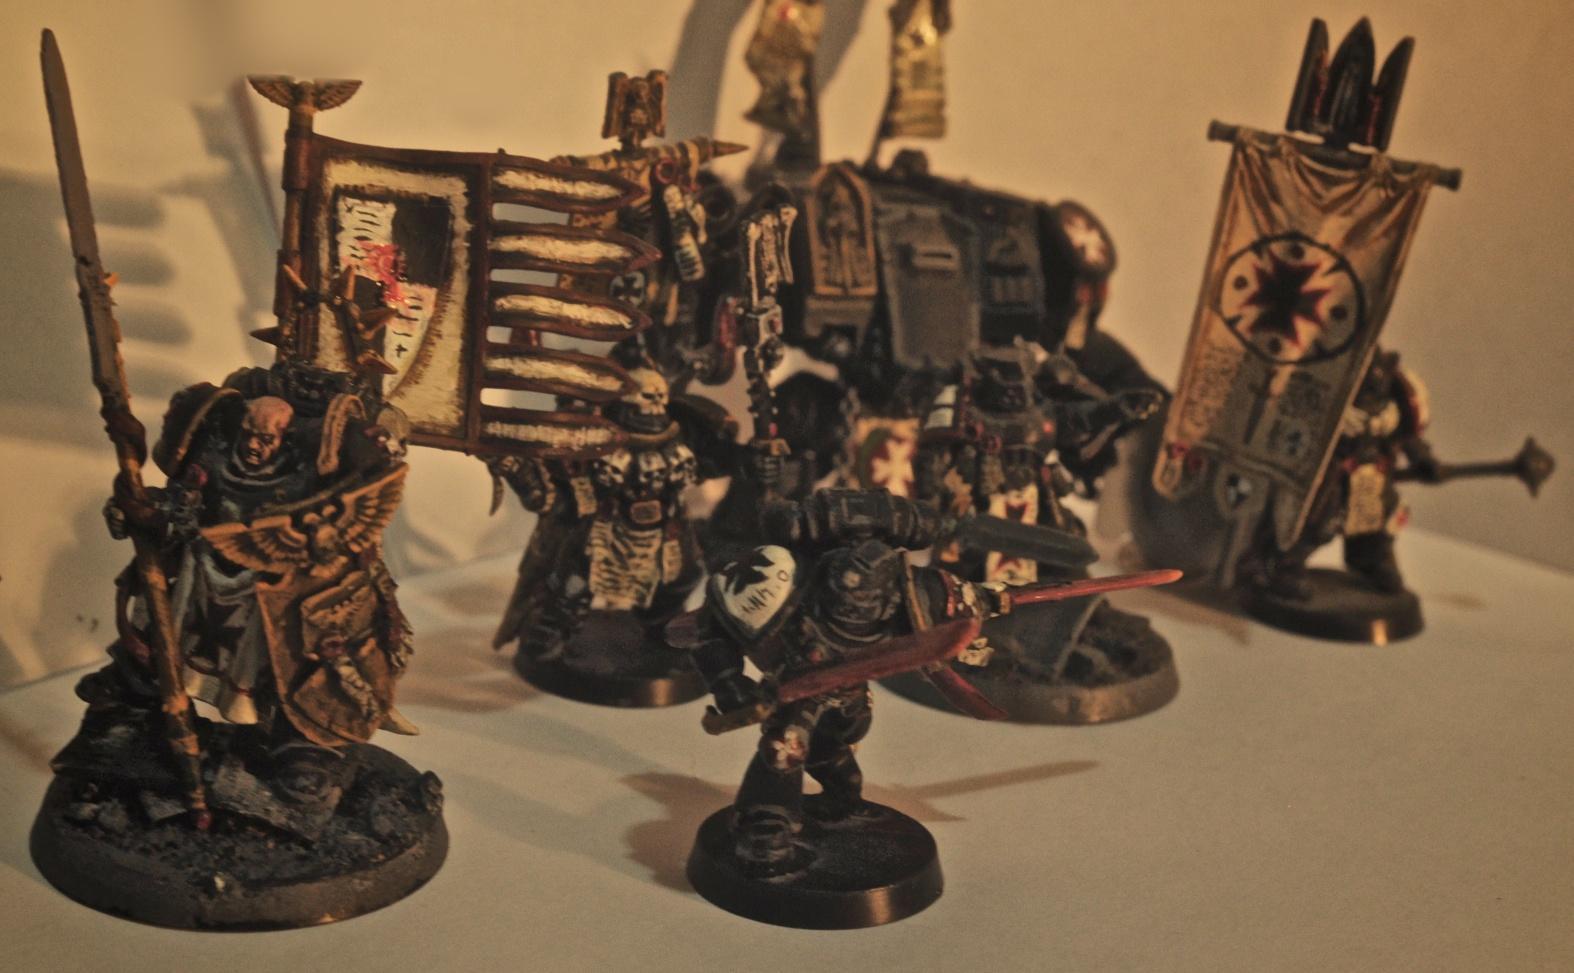 Black, Space, Space Marines, Templars, Warhammer 40,000, Warhammer Fantasy